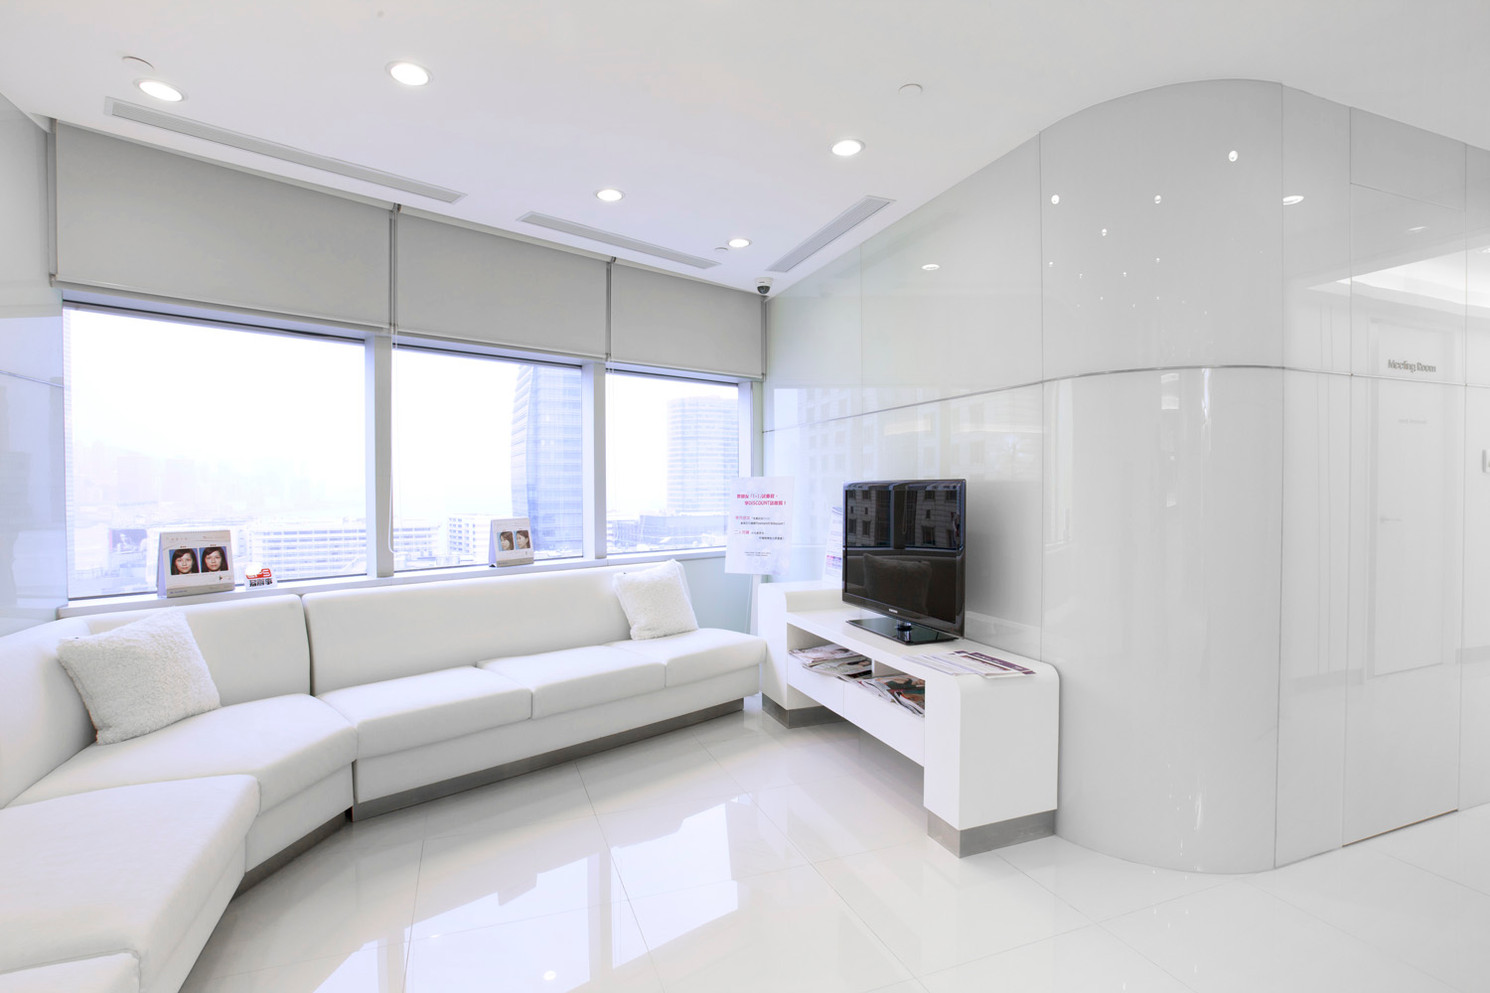 interiors0009.jpg